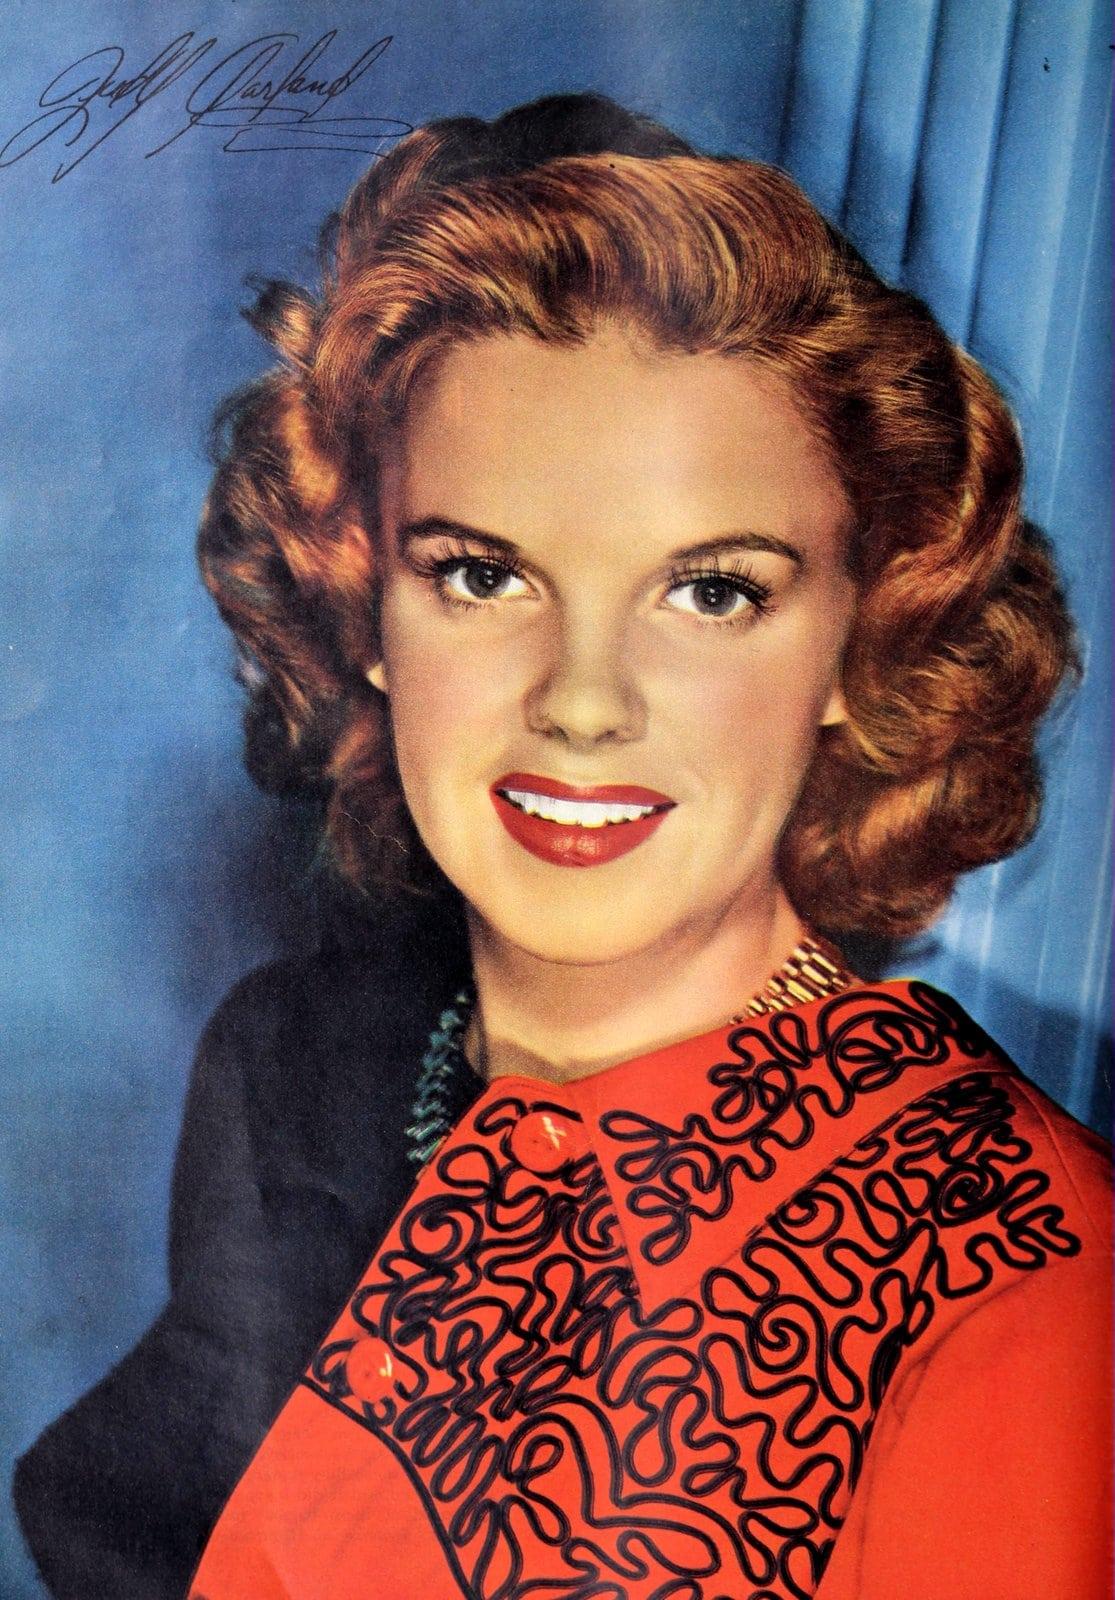 Vintage 1940s actress Judy Garland wearing red lipstick